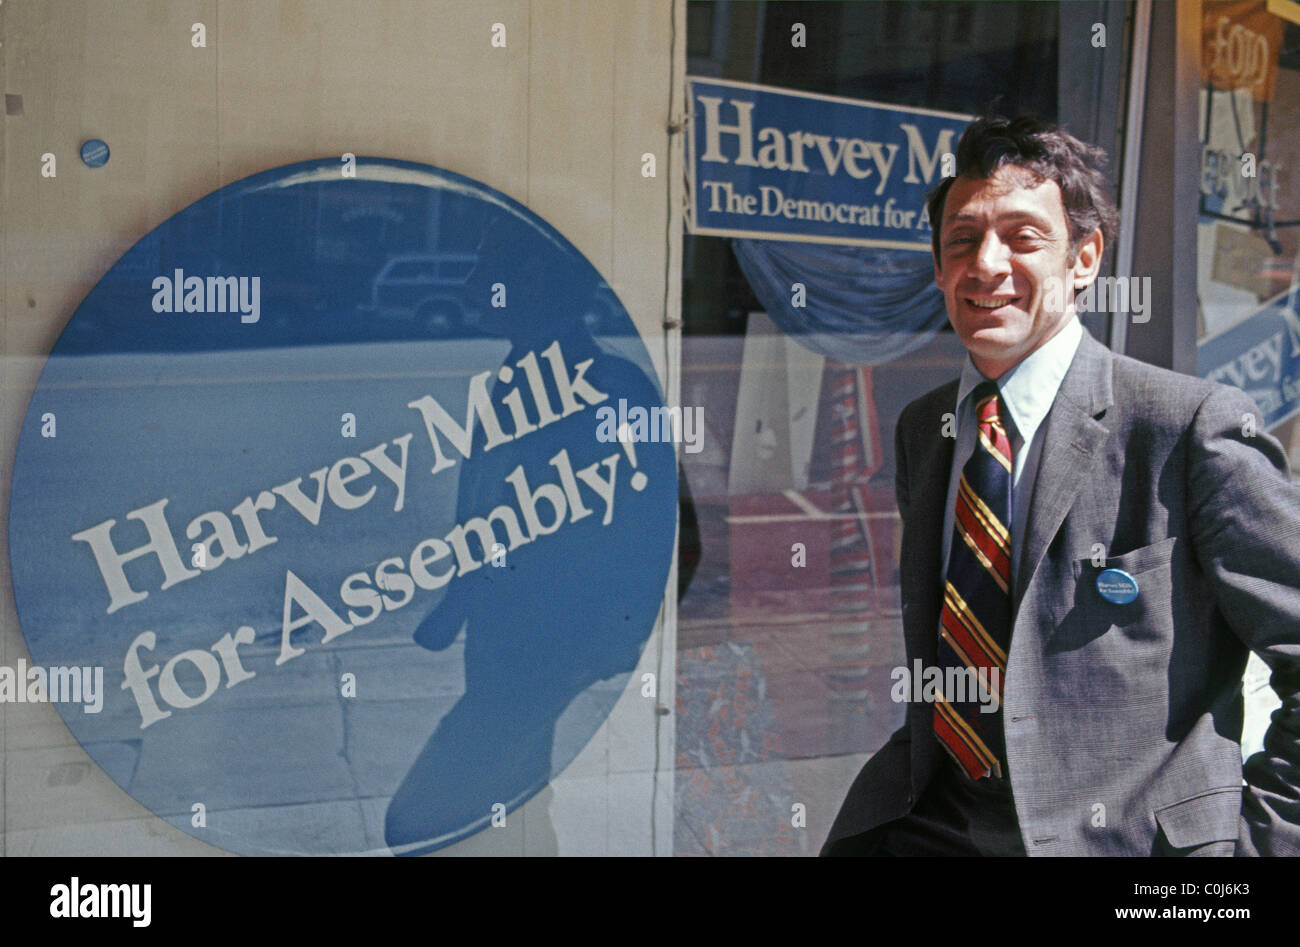 Harvey Milk runs for California State Assembly, at his camera store in 1976, San Francisco, USA - Stock Image